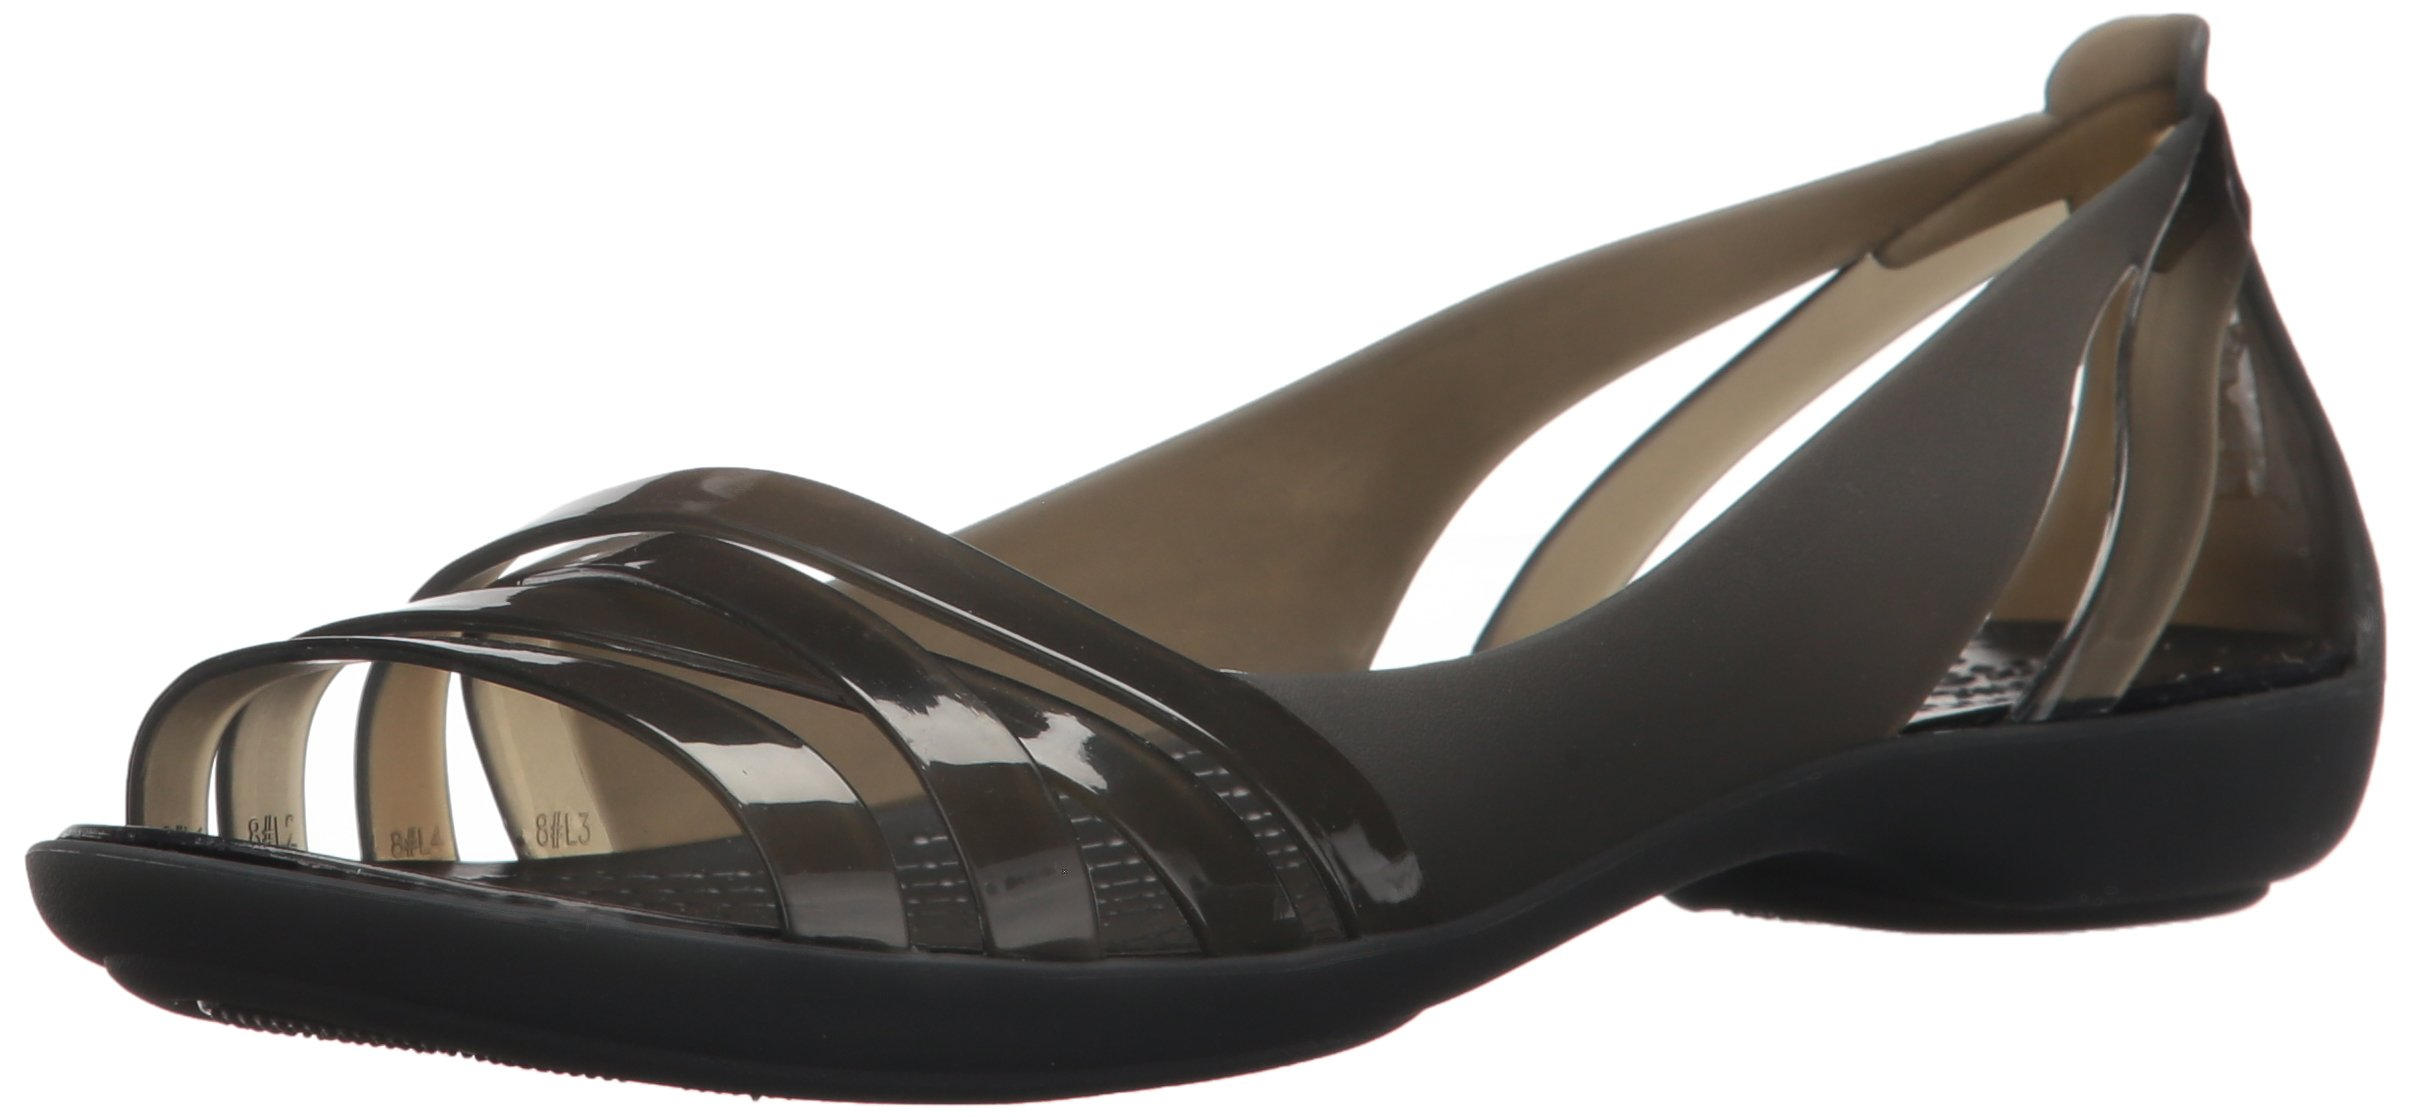 Crocs Women's Isabella Huarache 2 Flat W Sandal Black, 8 M US